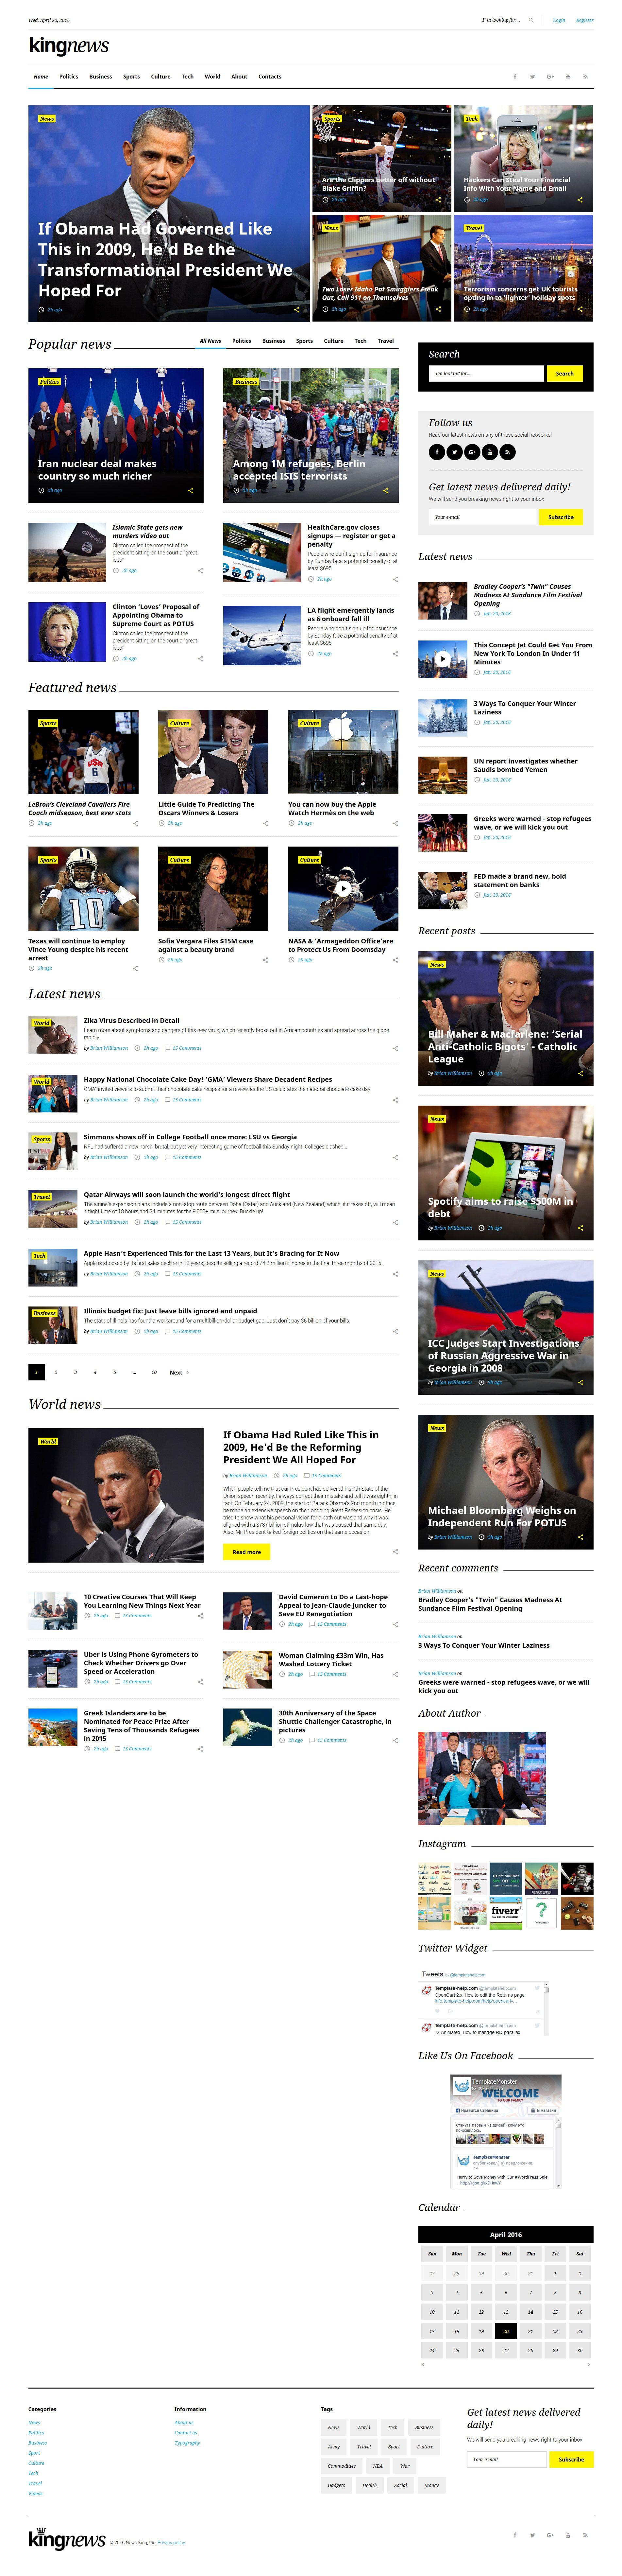 King News - Multipurpose Website Template | Pinterest | Template ...